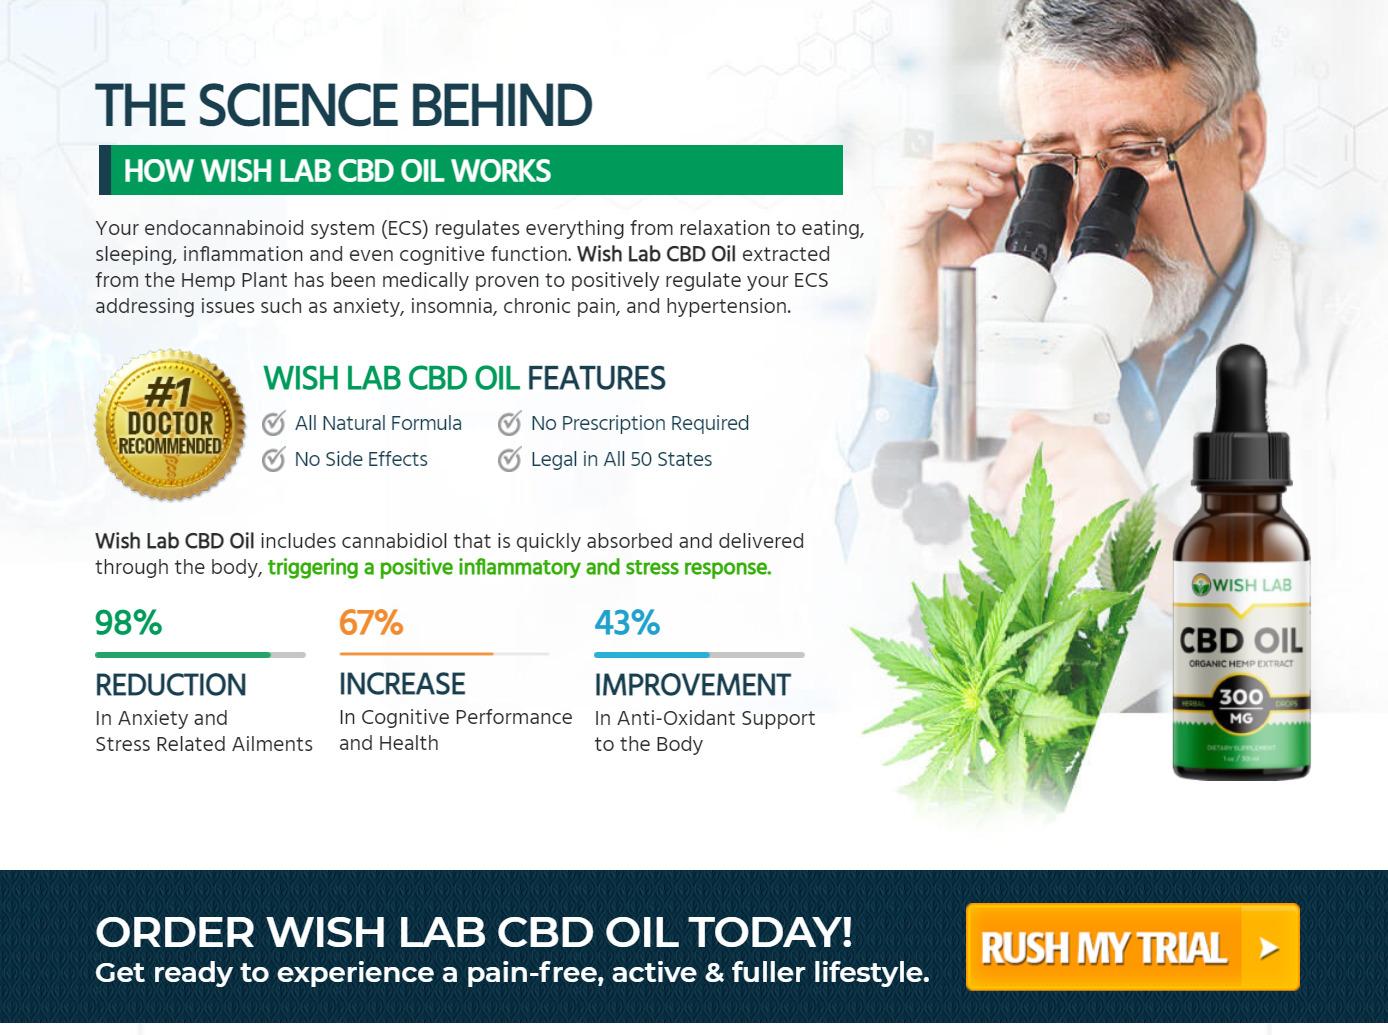 wish lab cbd oil rev